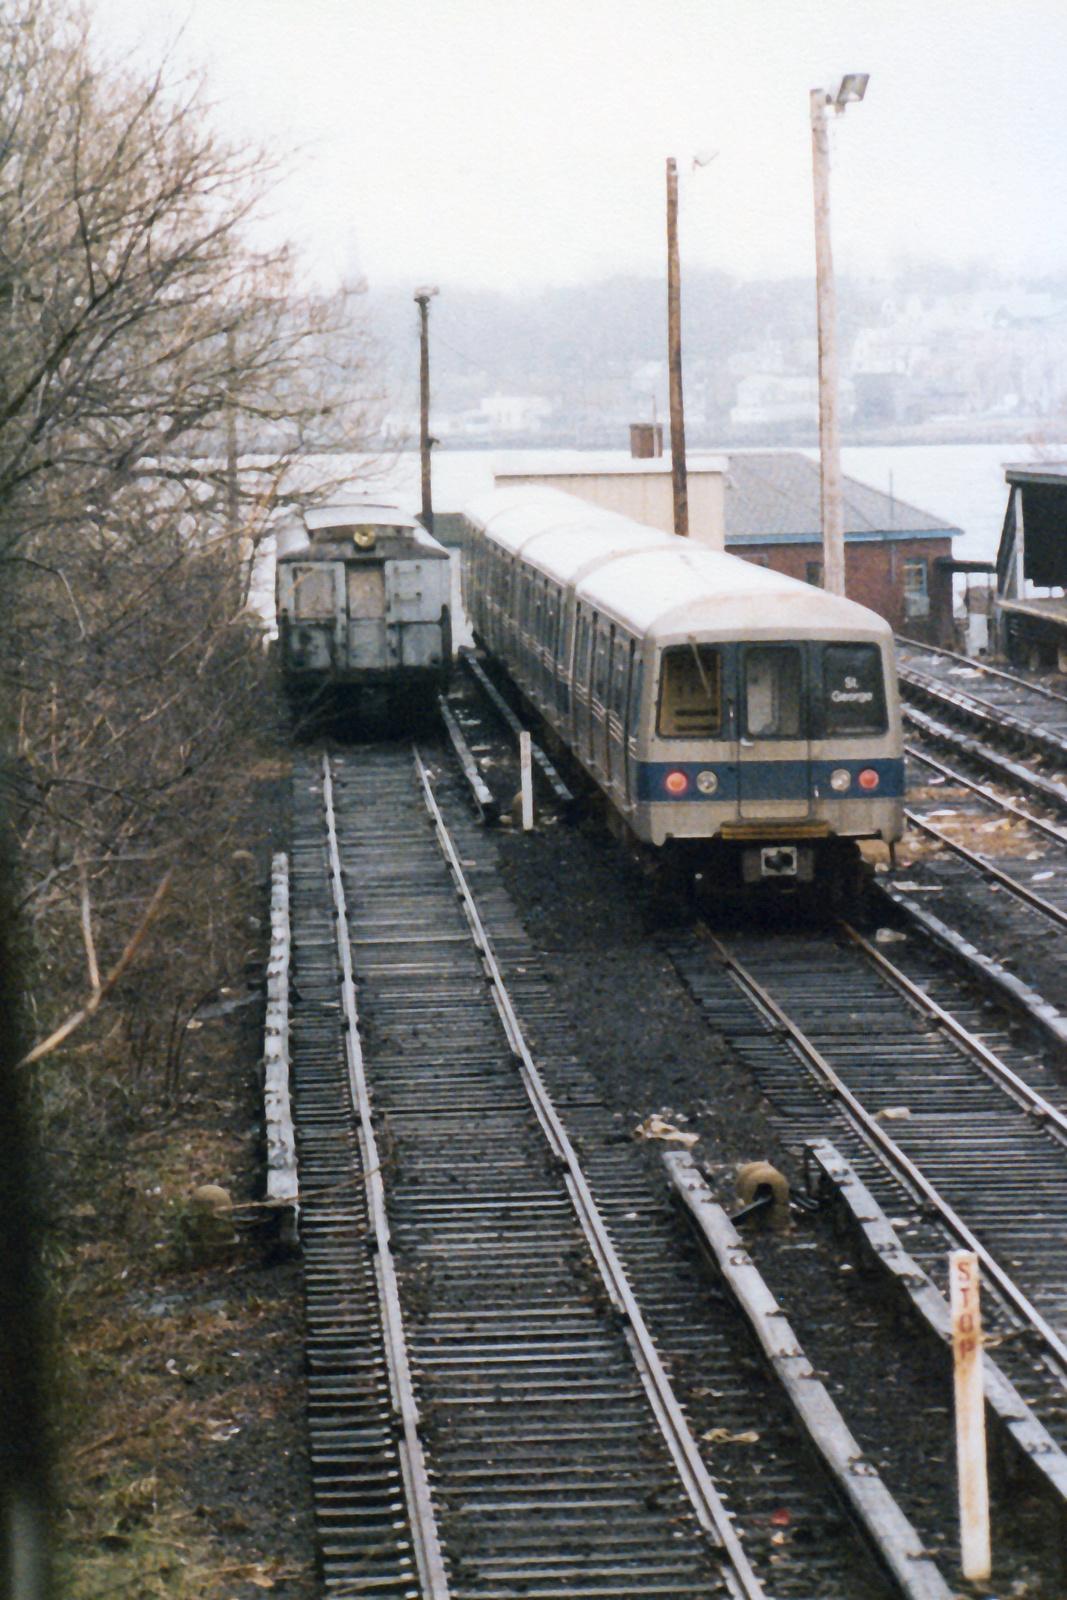 (810k, 1067x1600)<br><b>Country:</b> United States<br><b>City:</b> New York<br><b>System:</b> New York City Transit<br><b>Line:</b> SIRT<br><b>Location:</b> Tottenville <br><b>Car:</b> R-44 SIRT (St. Louis, 1971-1973)  <br><b>Collection of:</b> Nicholas Fabrizio<br><b>Viewed (this week/total):</b> 4 / 322